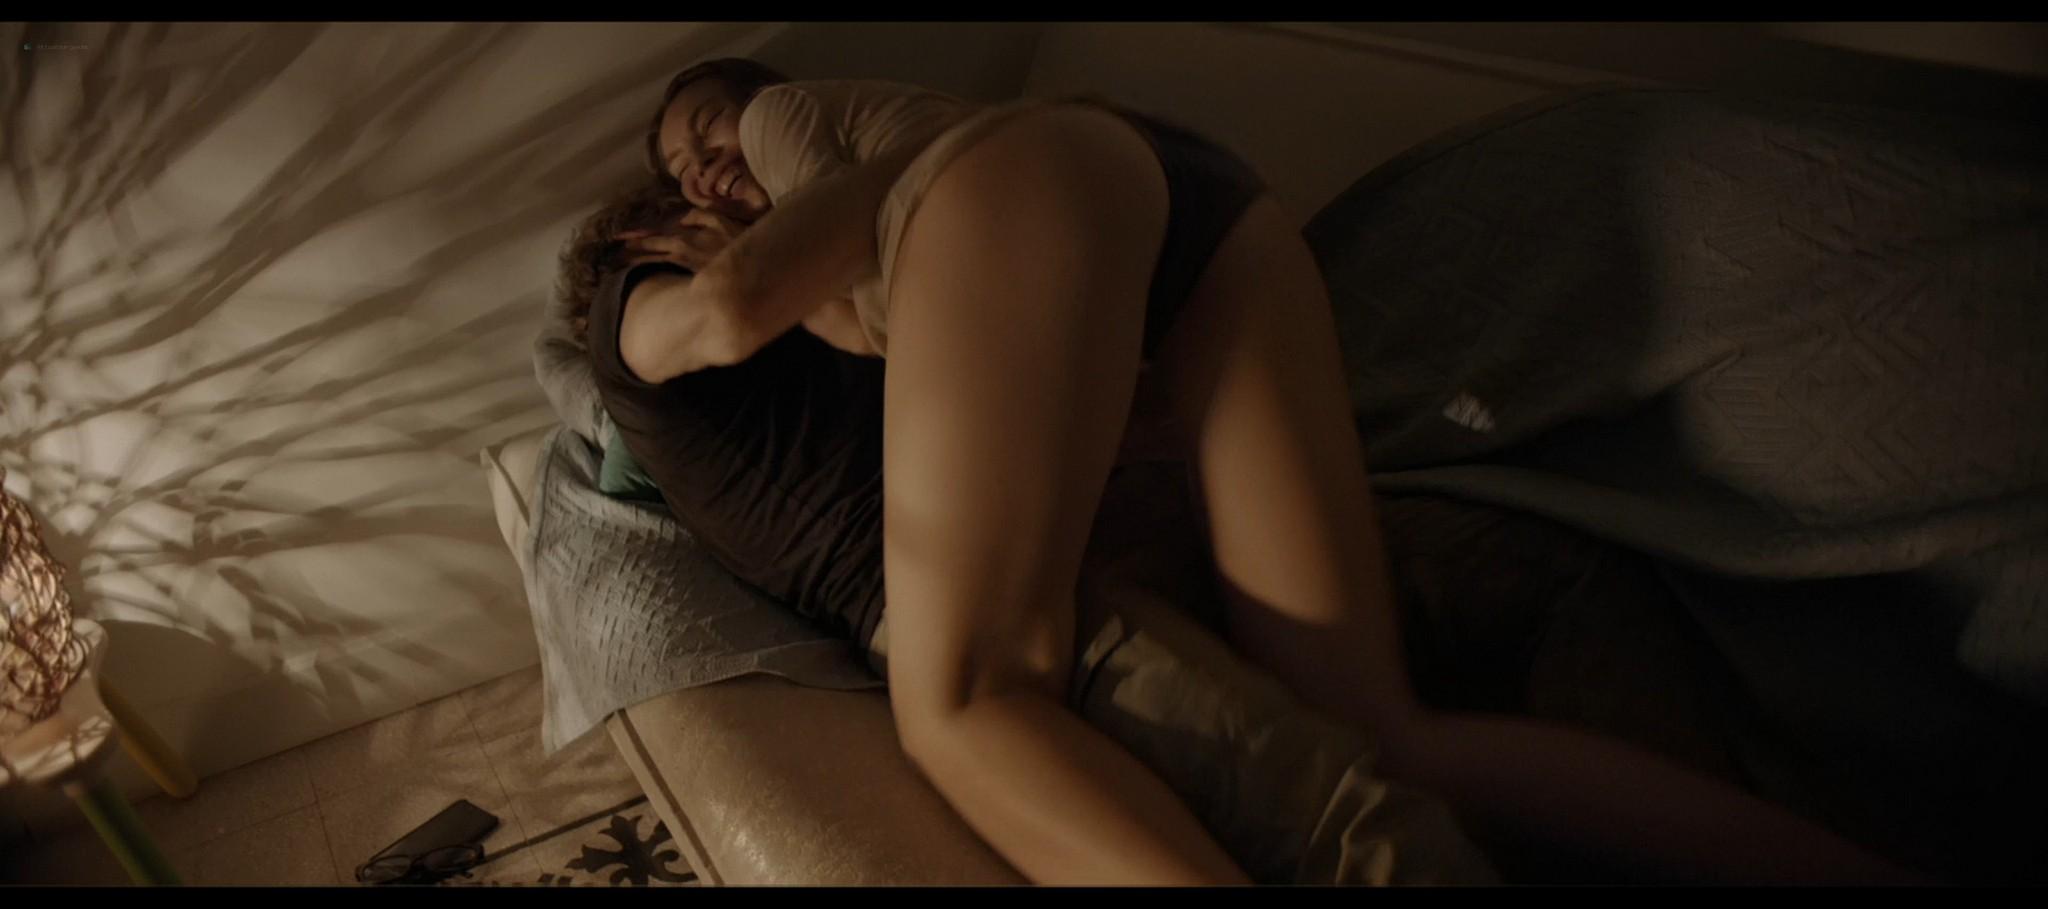 Cristina Chiriac nude full frontal Sofia Rania Dharma Mangia Woods full frontal too Tommaso 2019 HD 1080p Bluray 001